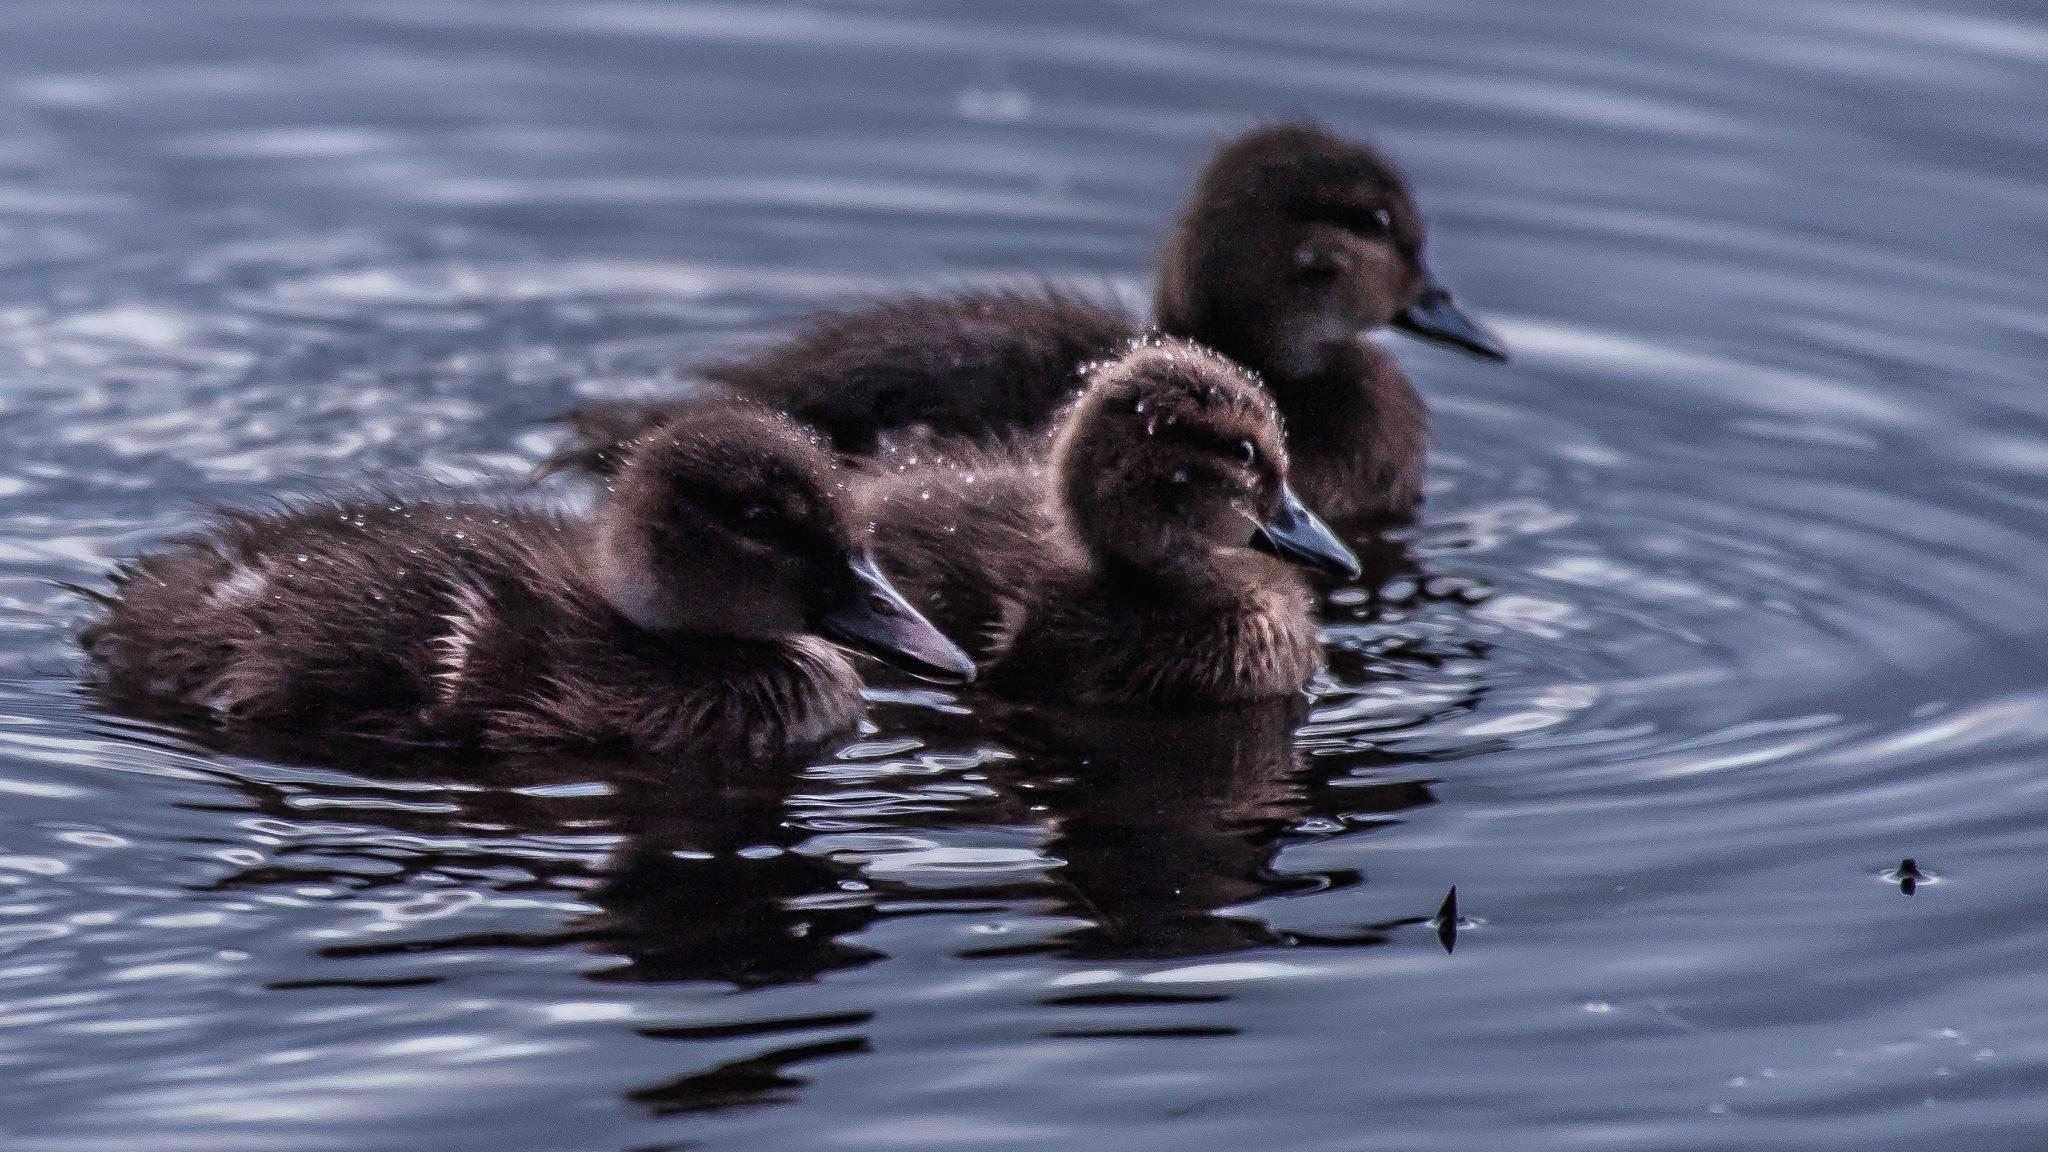 A day for Ducks by Trevor McKinnon